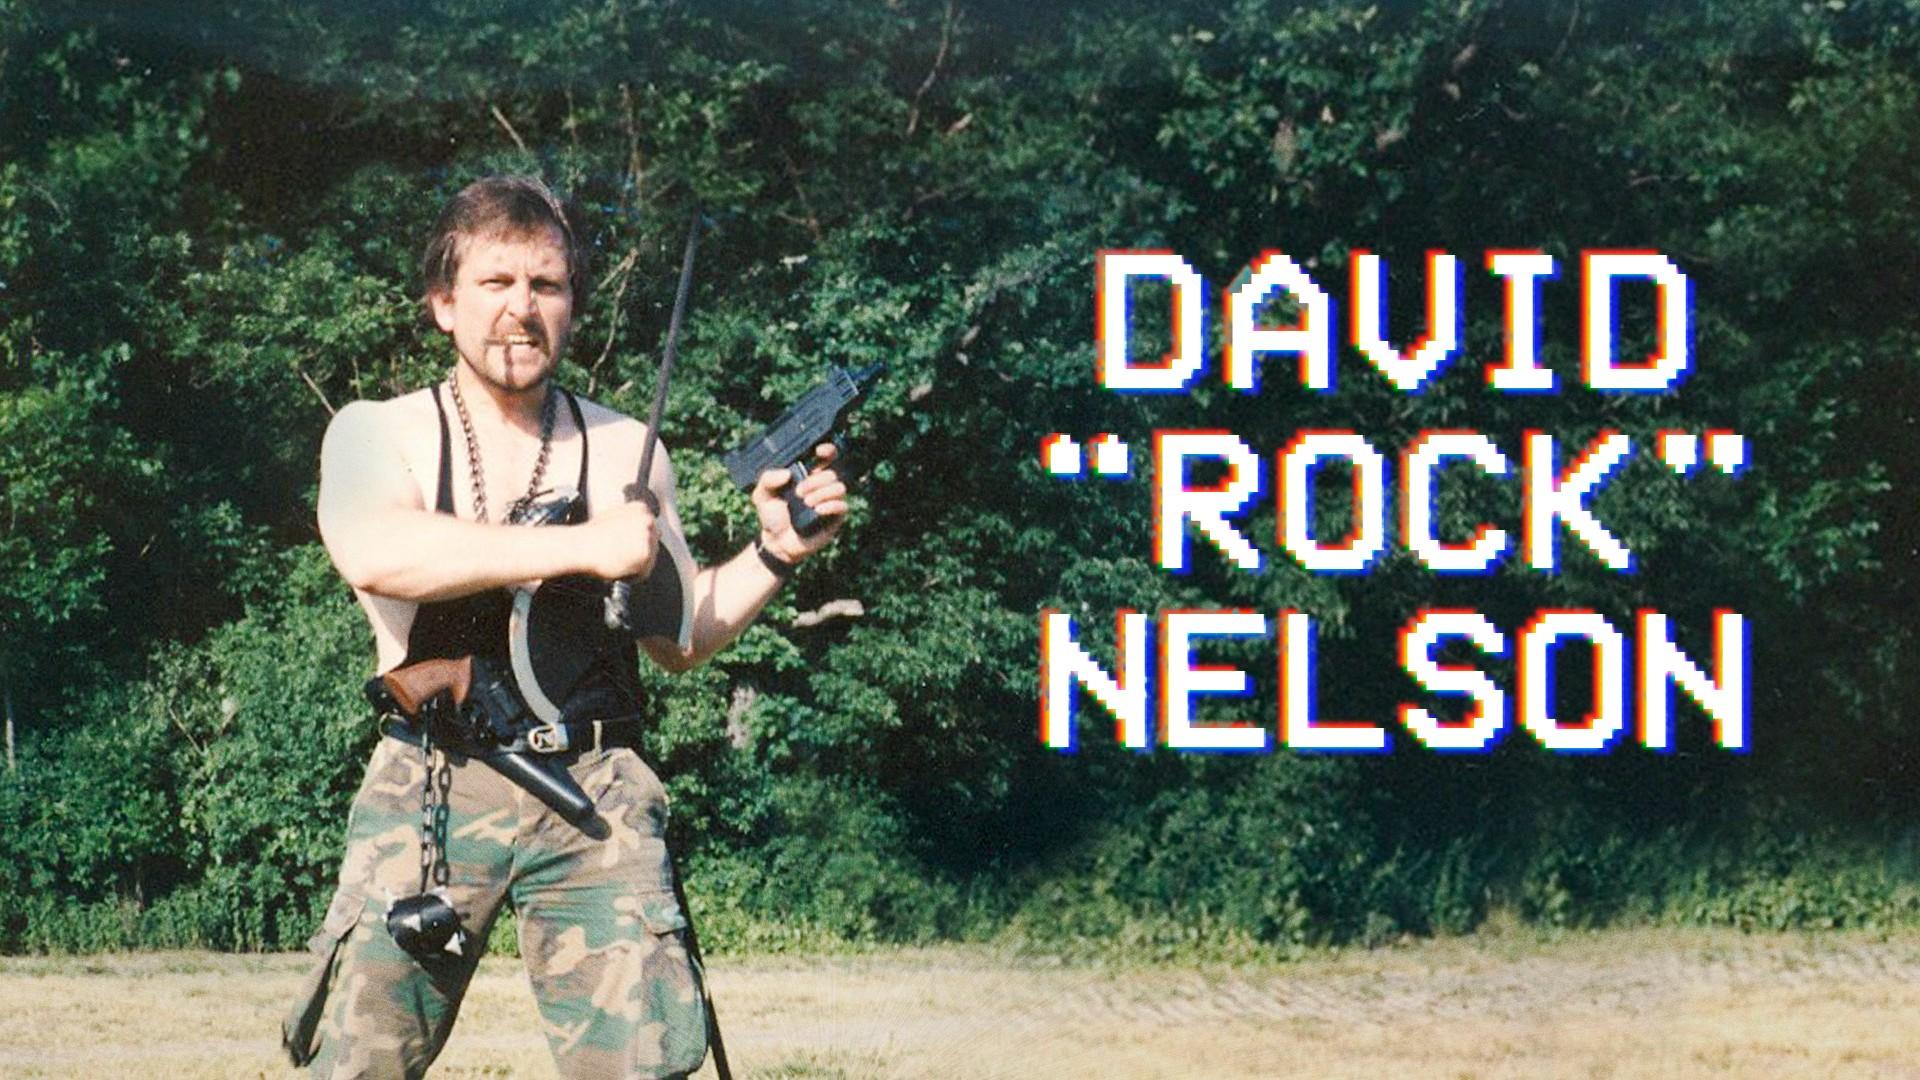 david u0027rock u0027 nelson has been creating monster movies in his